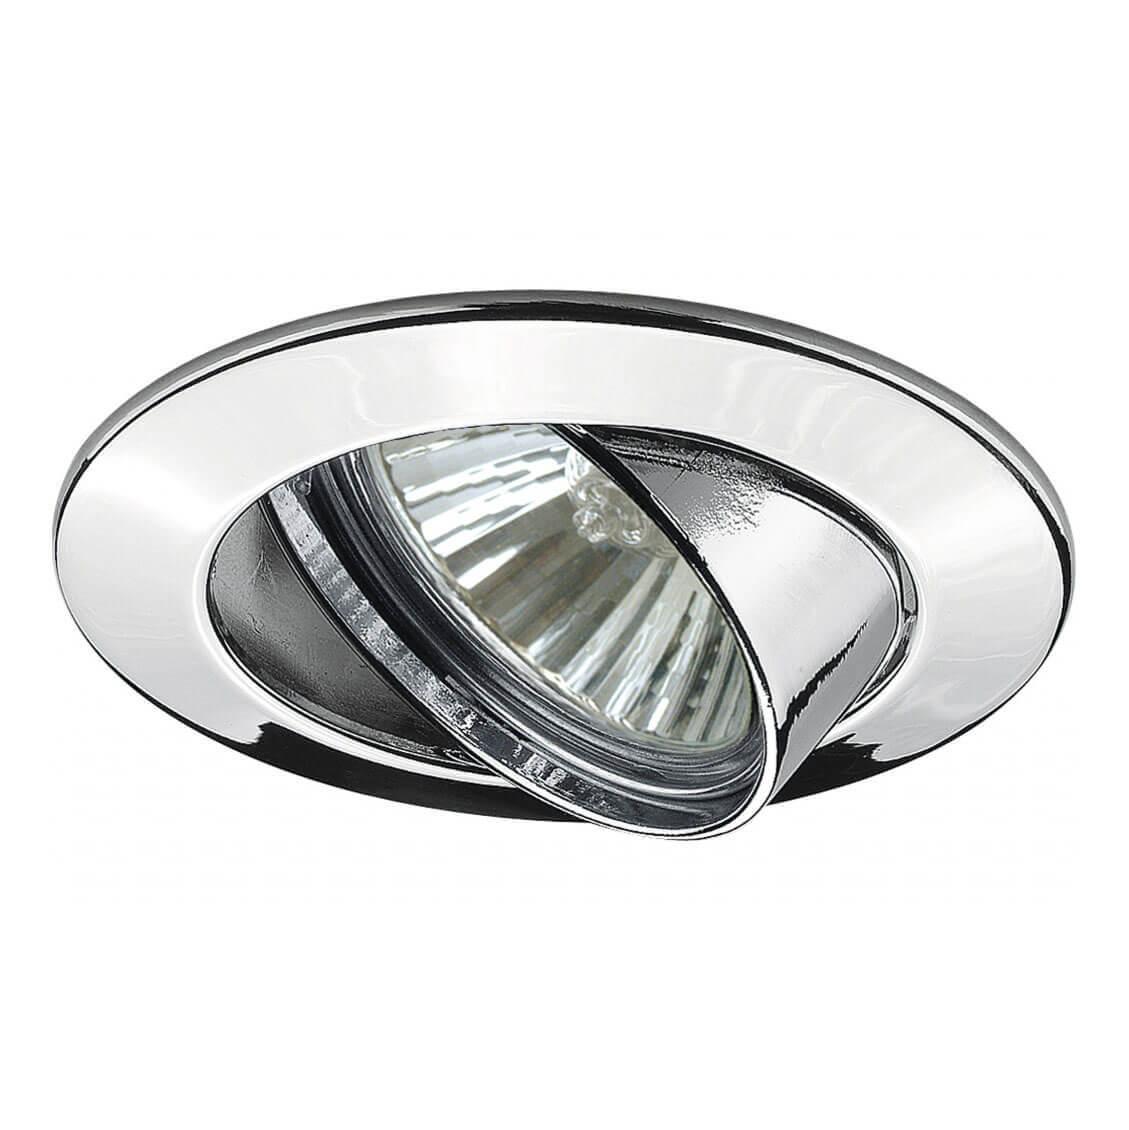 Светильник Paulmann 98944 Downlights Premium